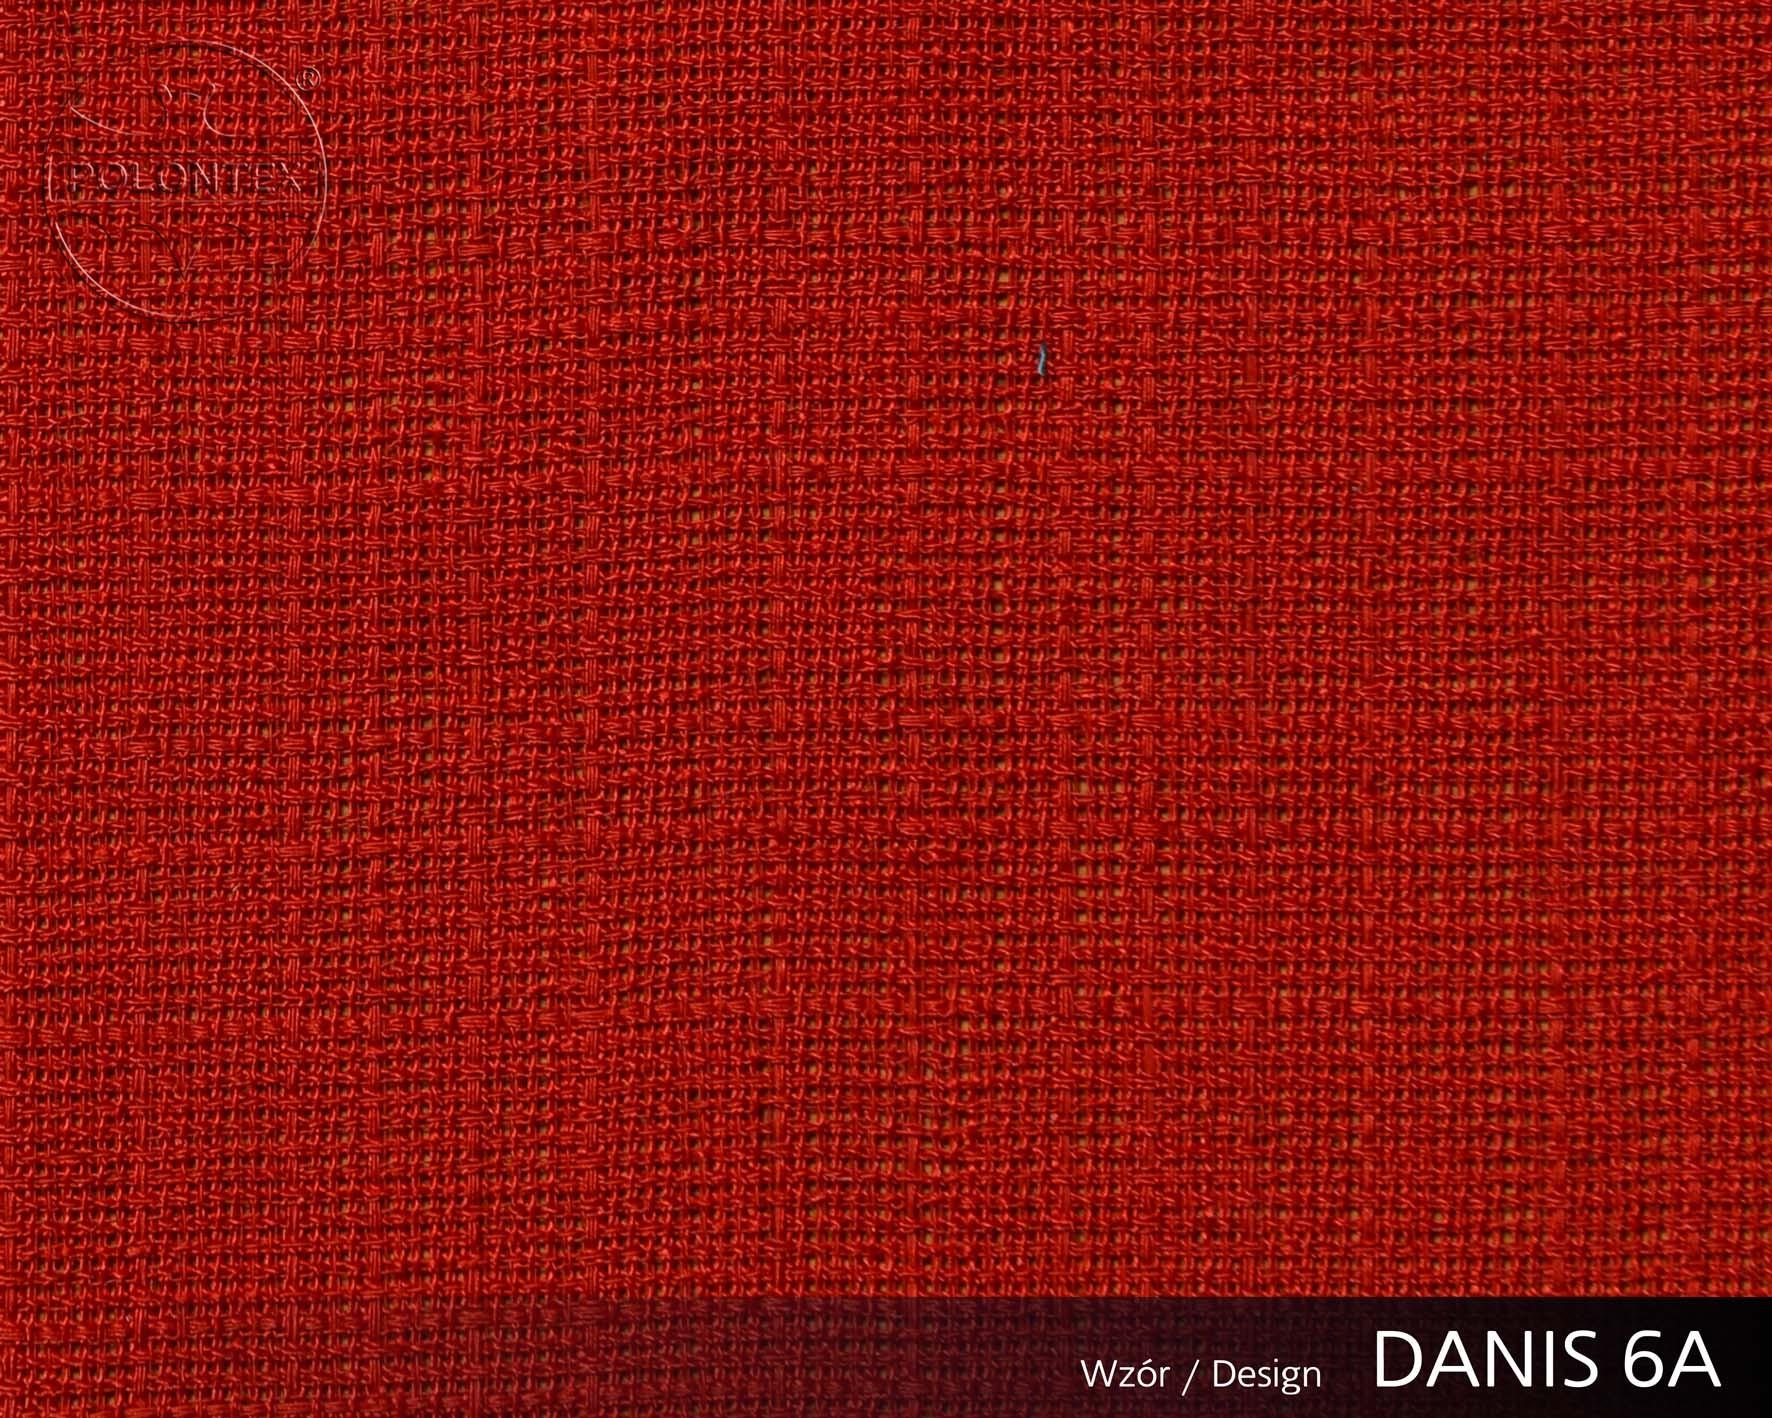 DANIŚ 3310